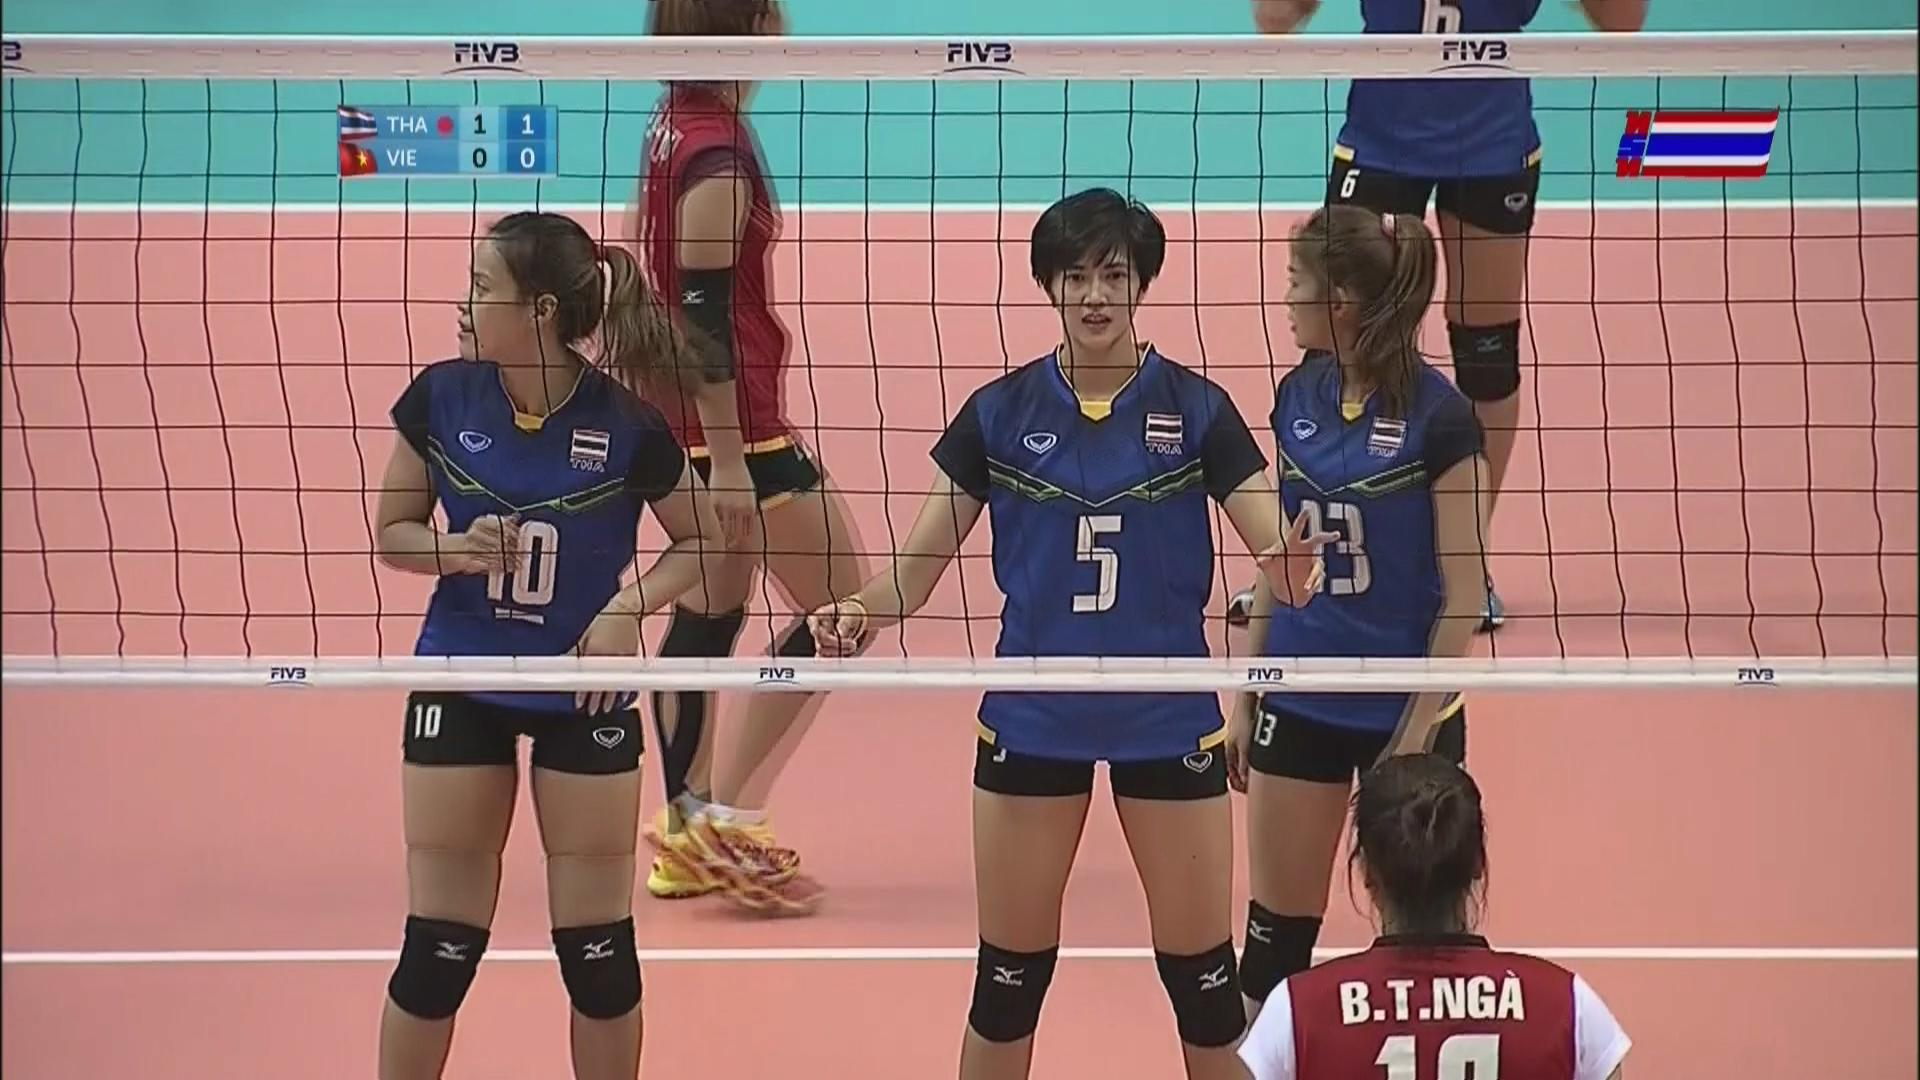 RT @MorningNewsTV3: #วอลเลย์บอลหญิง นัดชิงเหรียญทอง #ซีเกมส์ สาวไทยนำเวียดนาม 1-0 เซต ด้วยสกอร์25-18 #SEAGames2015 http://t.co/qZV4bgjNuy